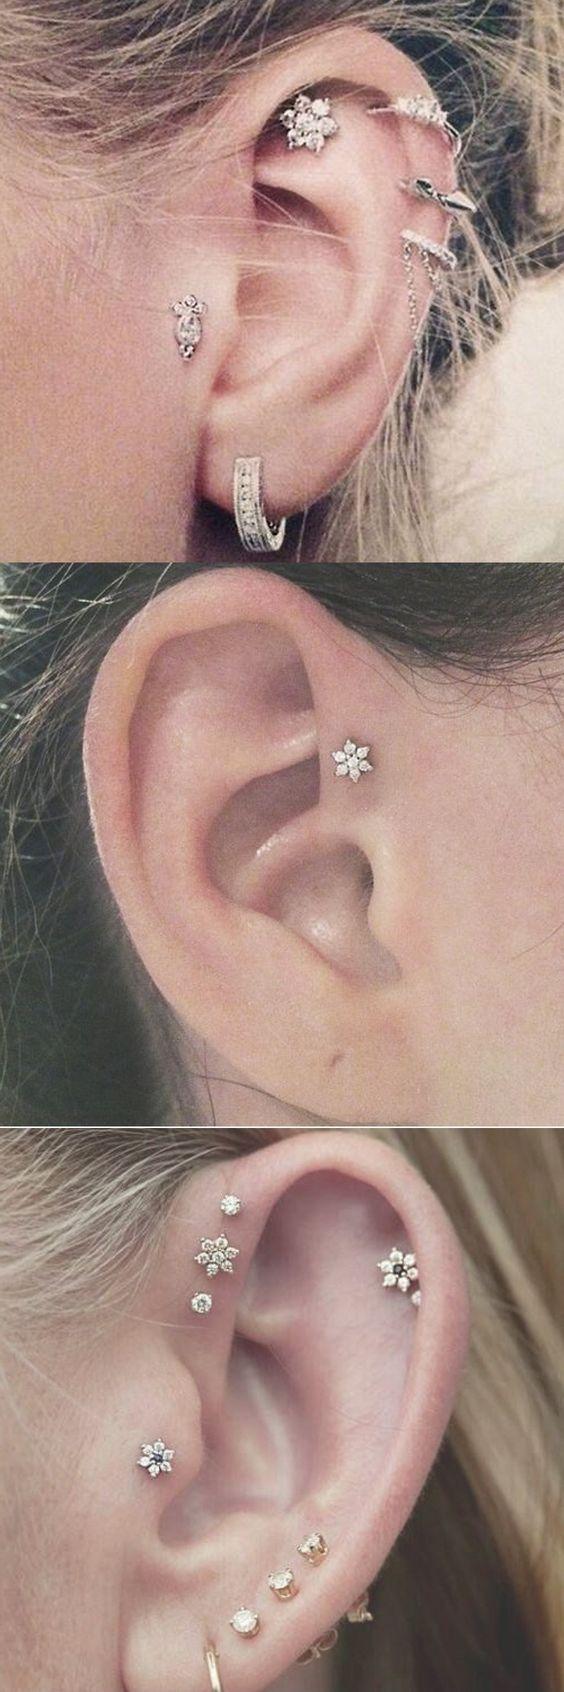 Pink Star Triple Cartilage Tragus Helix Stud Earring Jewelry Piercing